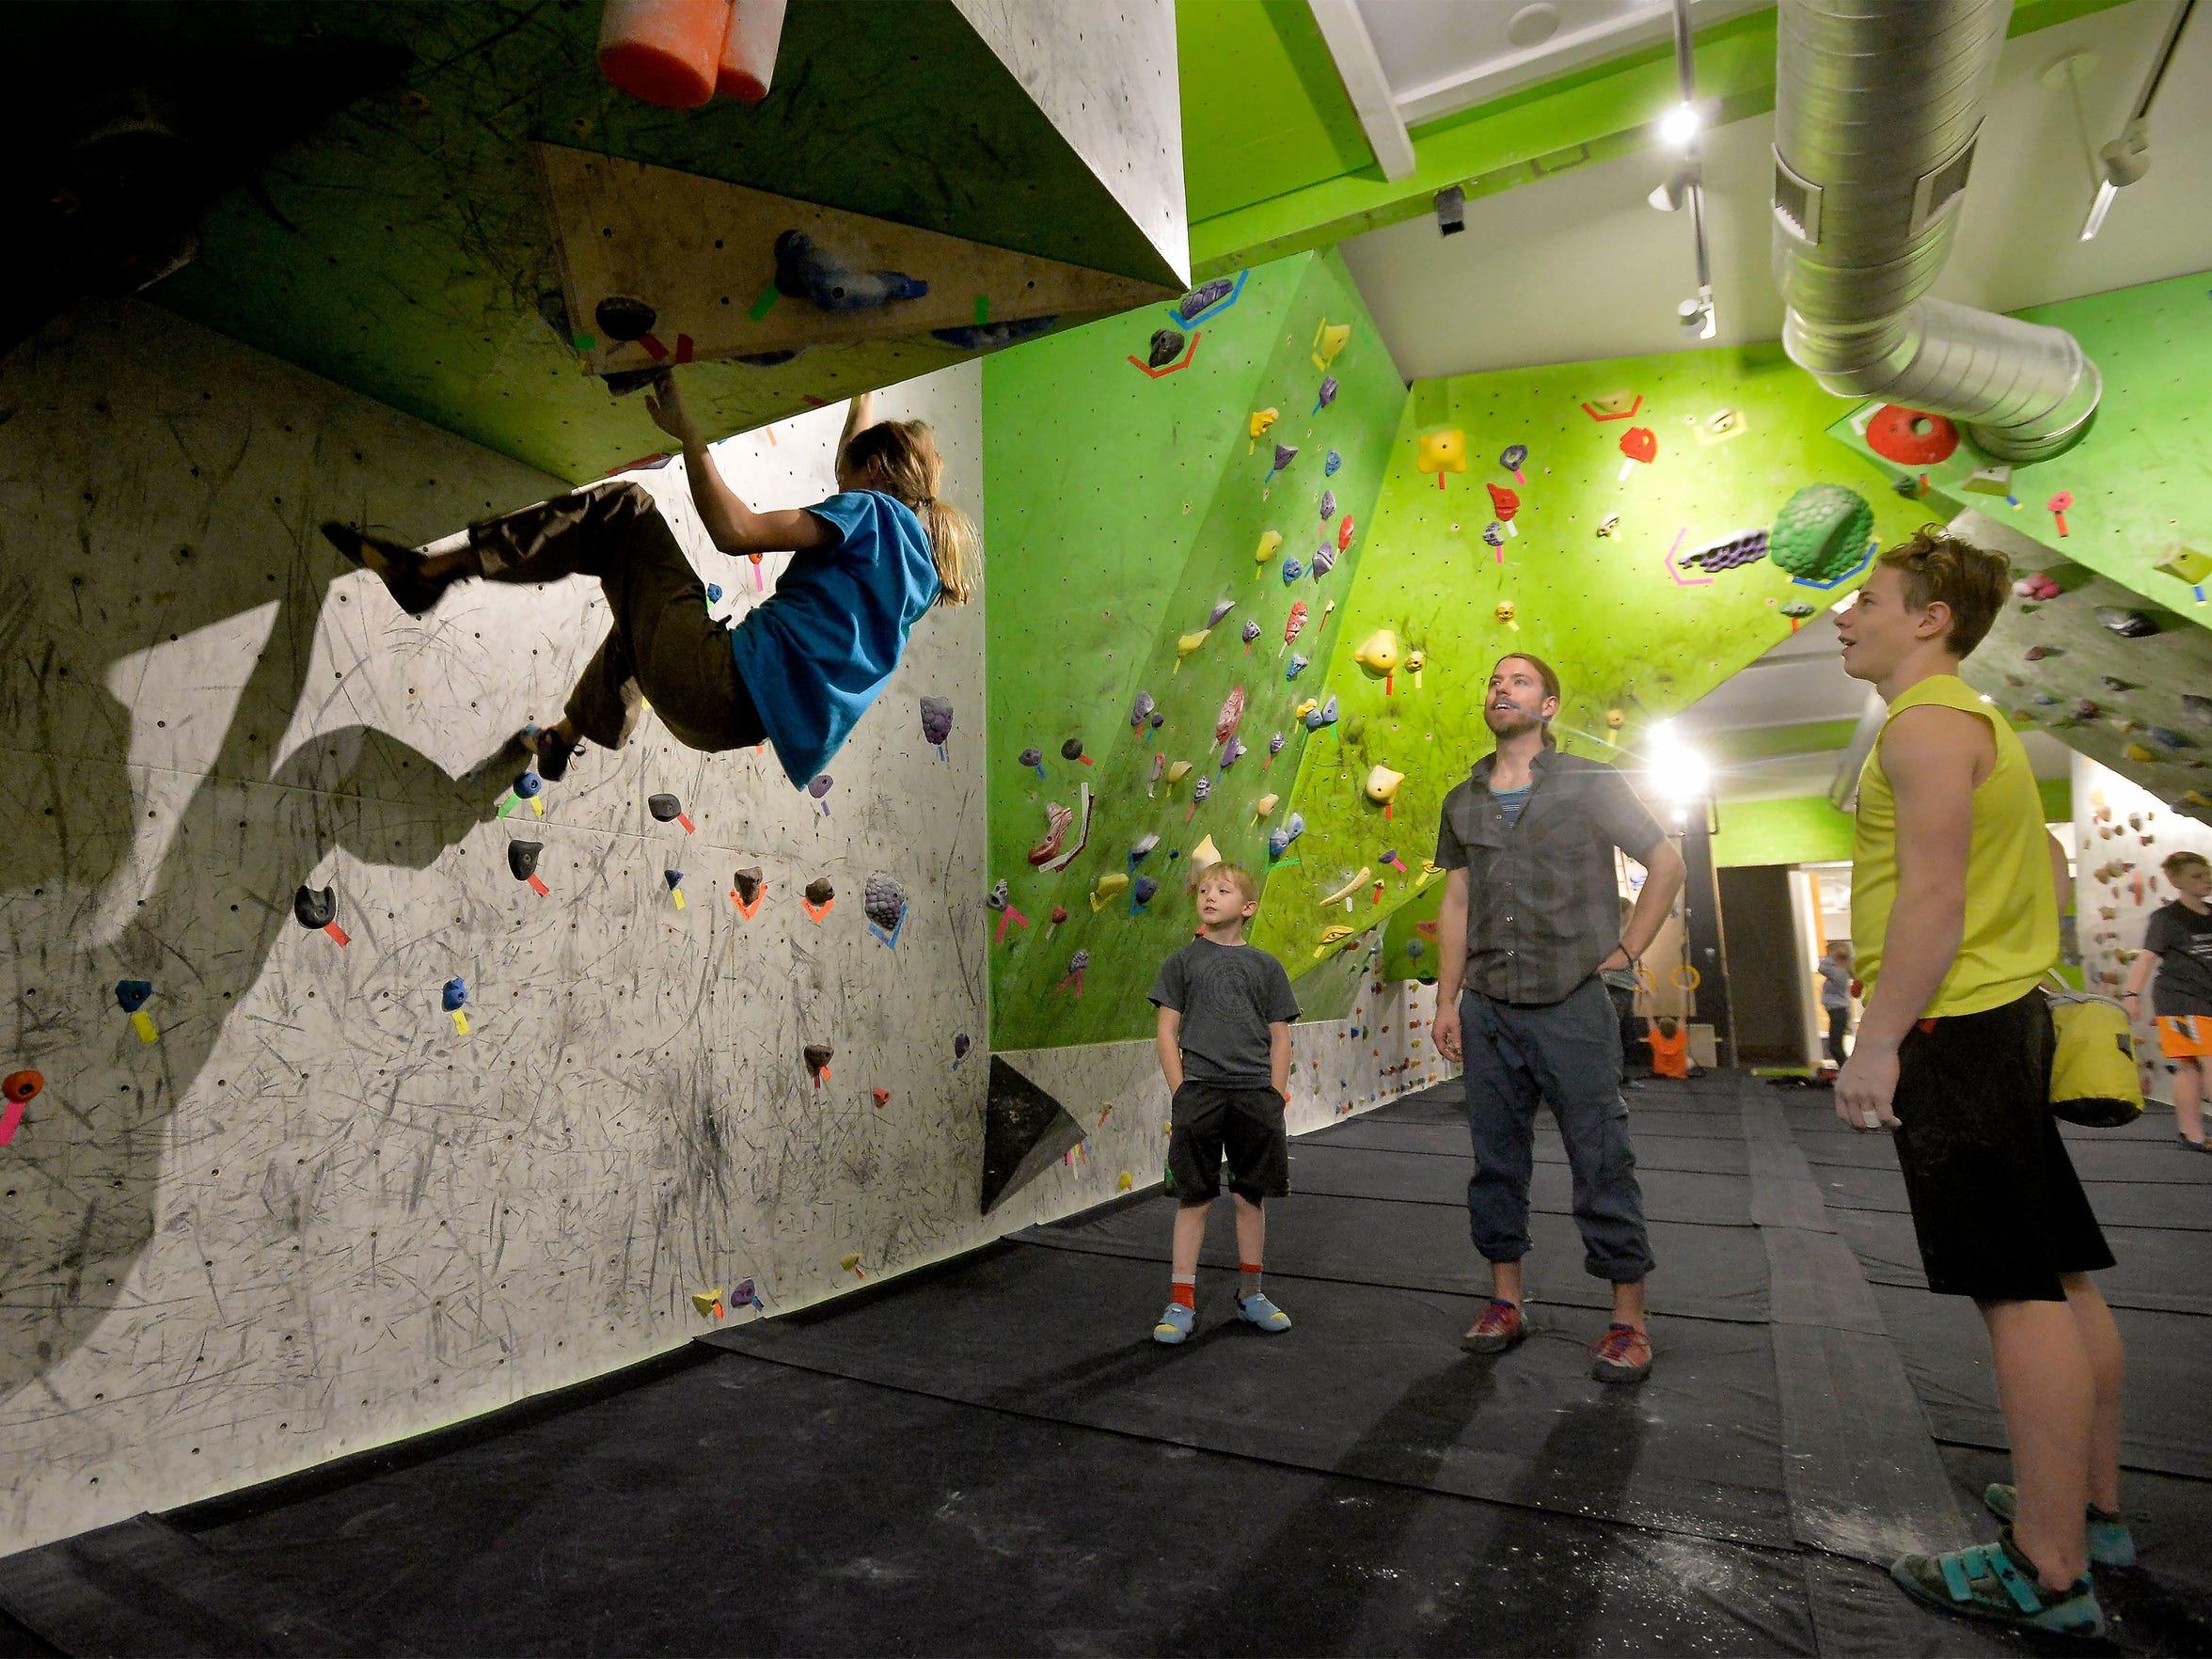 Christian Buhler, age 13, watches Hi-Line Climbing teammate, Layla Kerr, practice at Hi-Line Climbing Center.